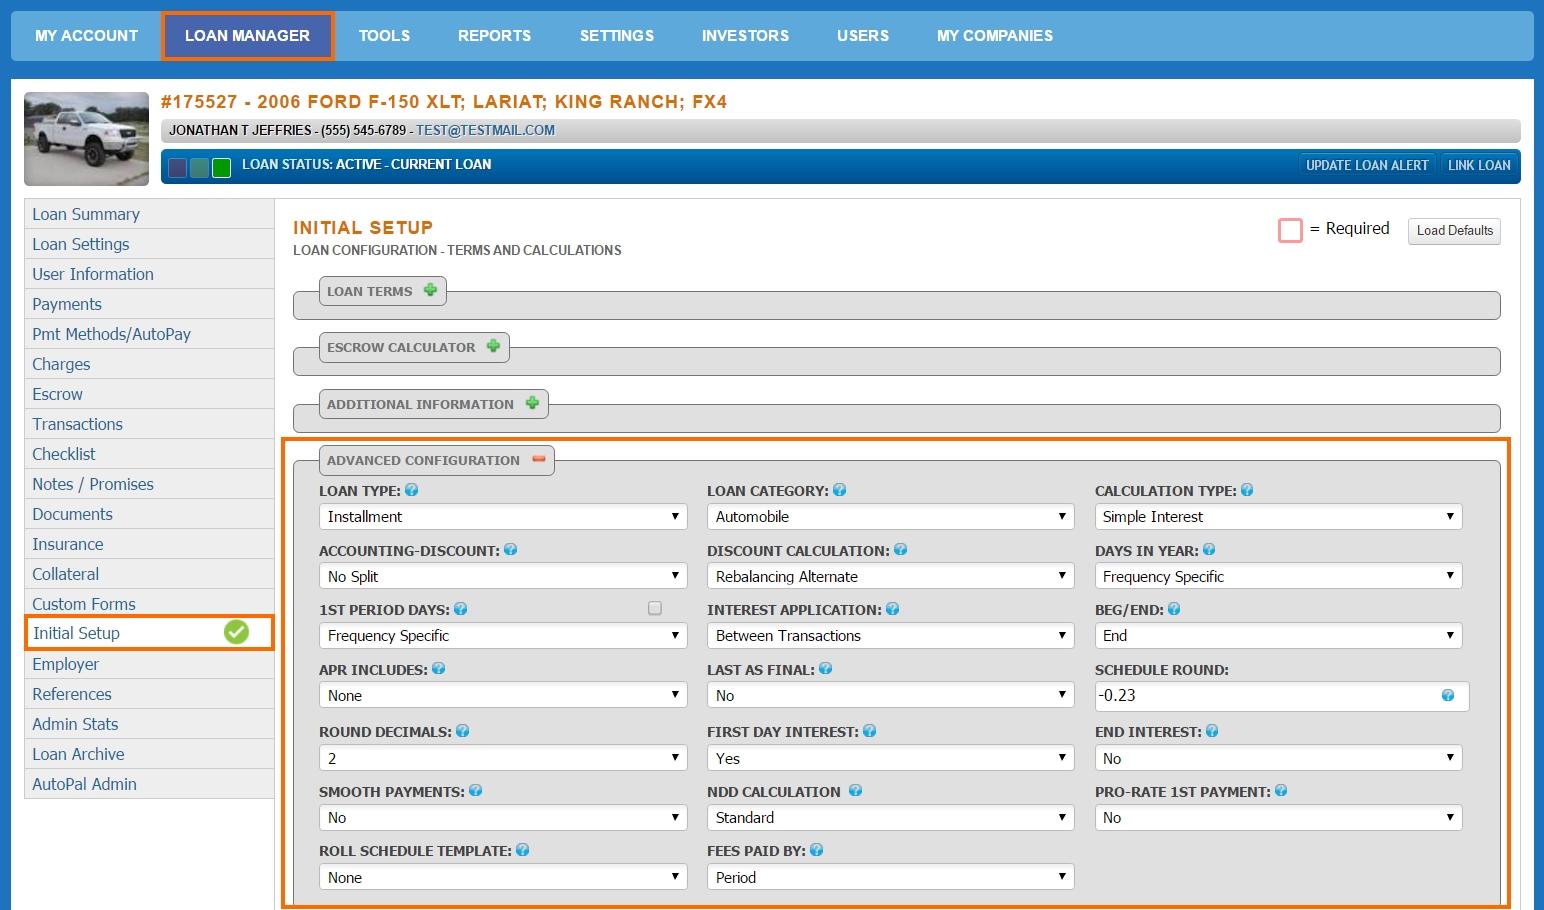 Loan Manager - Initial Setup - Advanced Configuration2